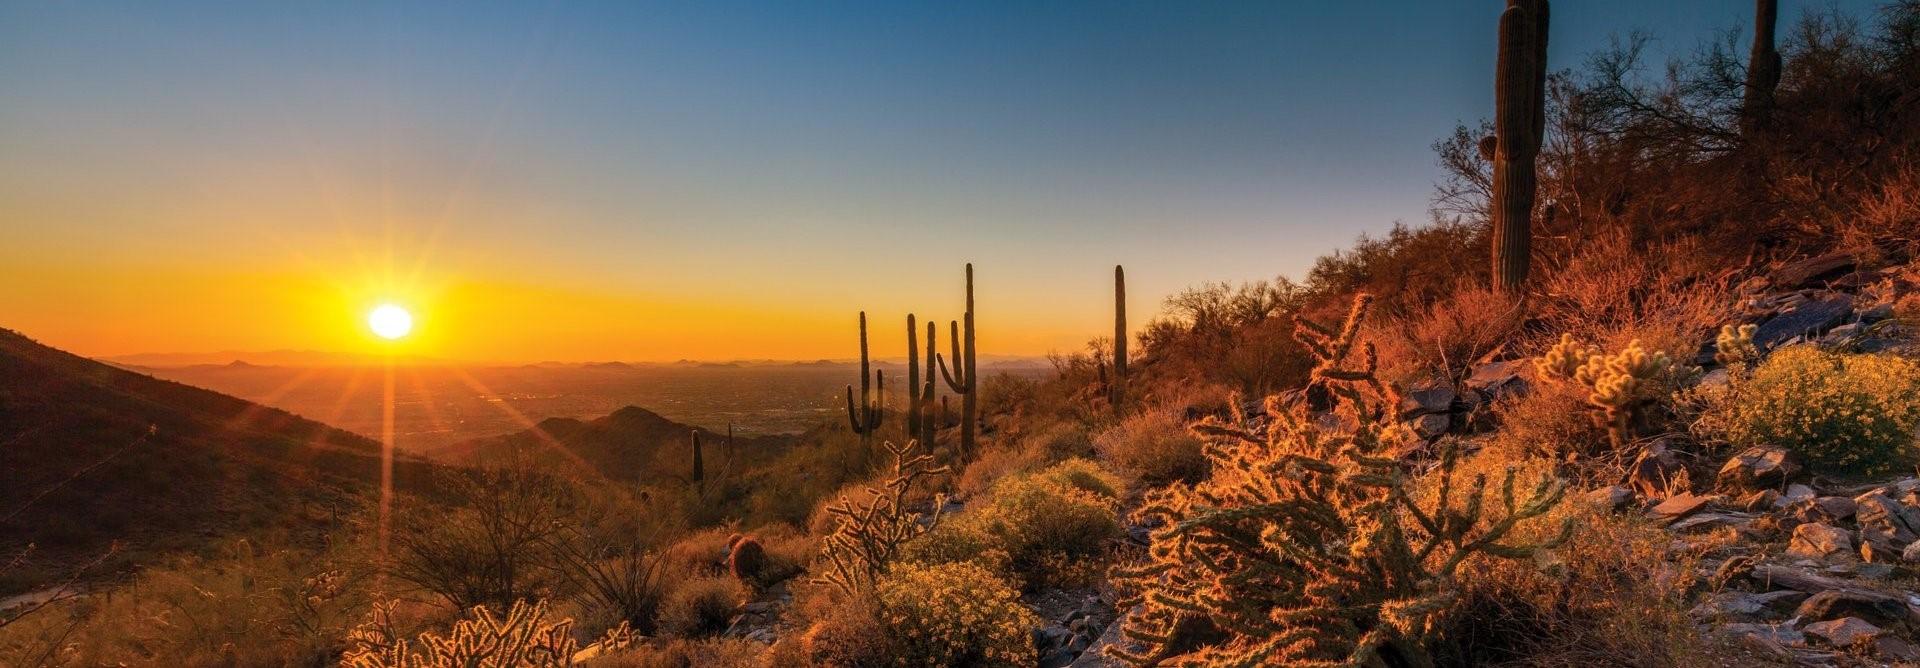 National Parks, Three Days Zion, Bryce Canyon, Grand Canyon, Vegas Strip